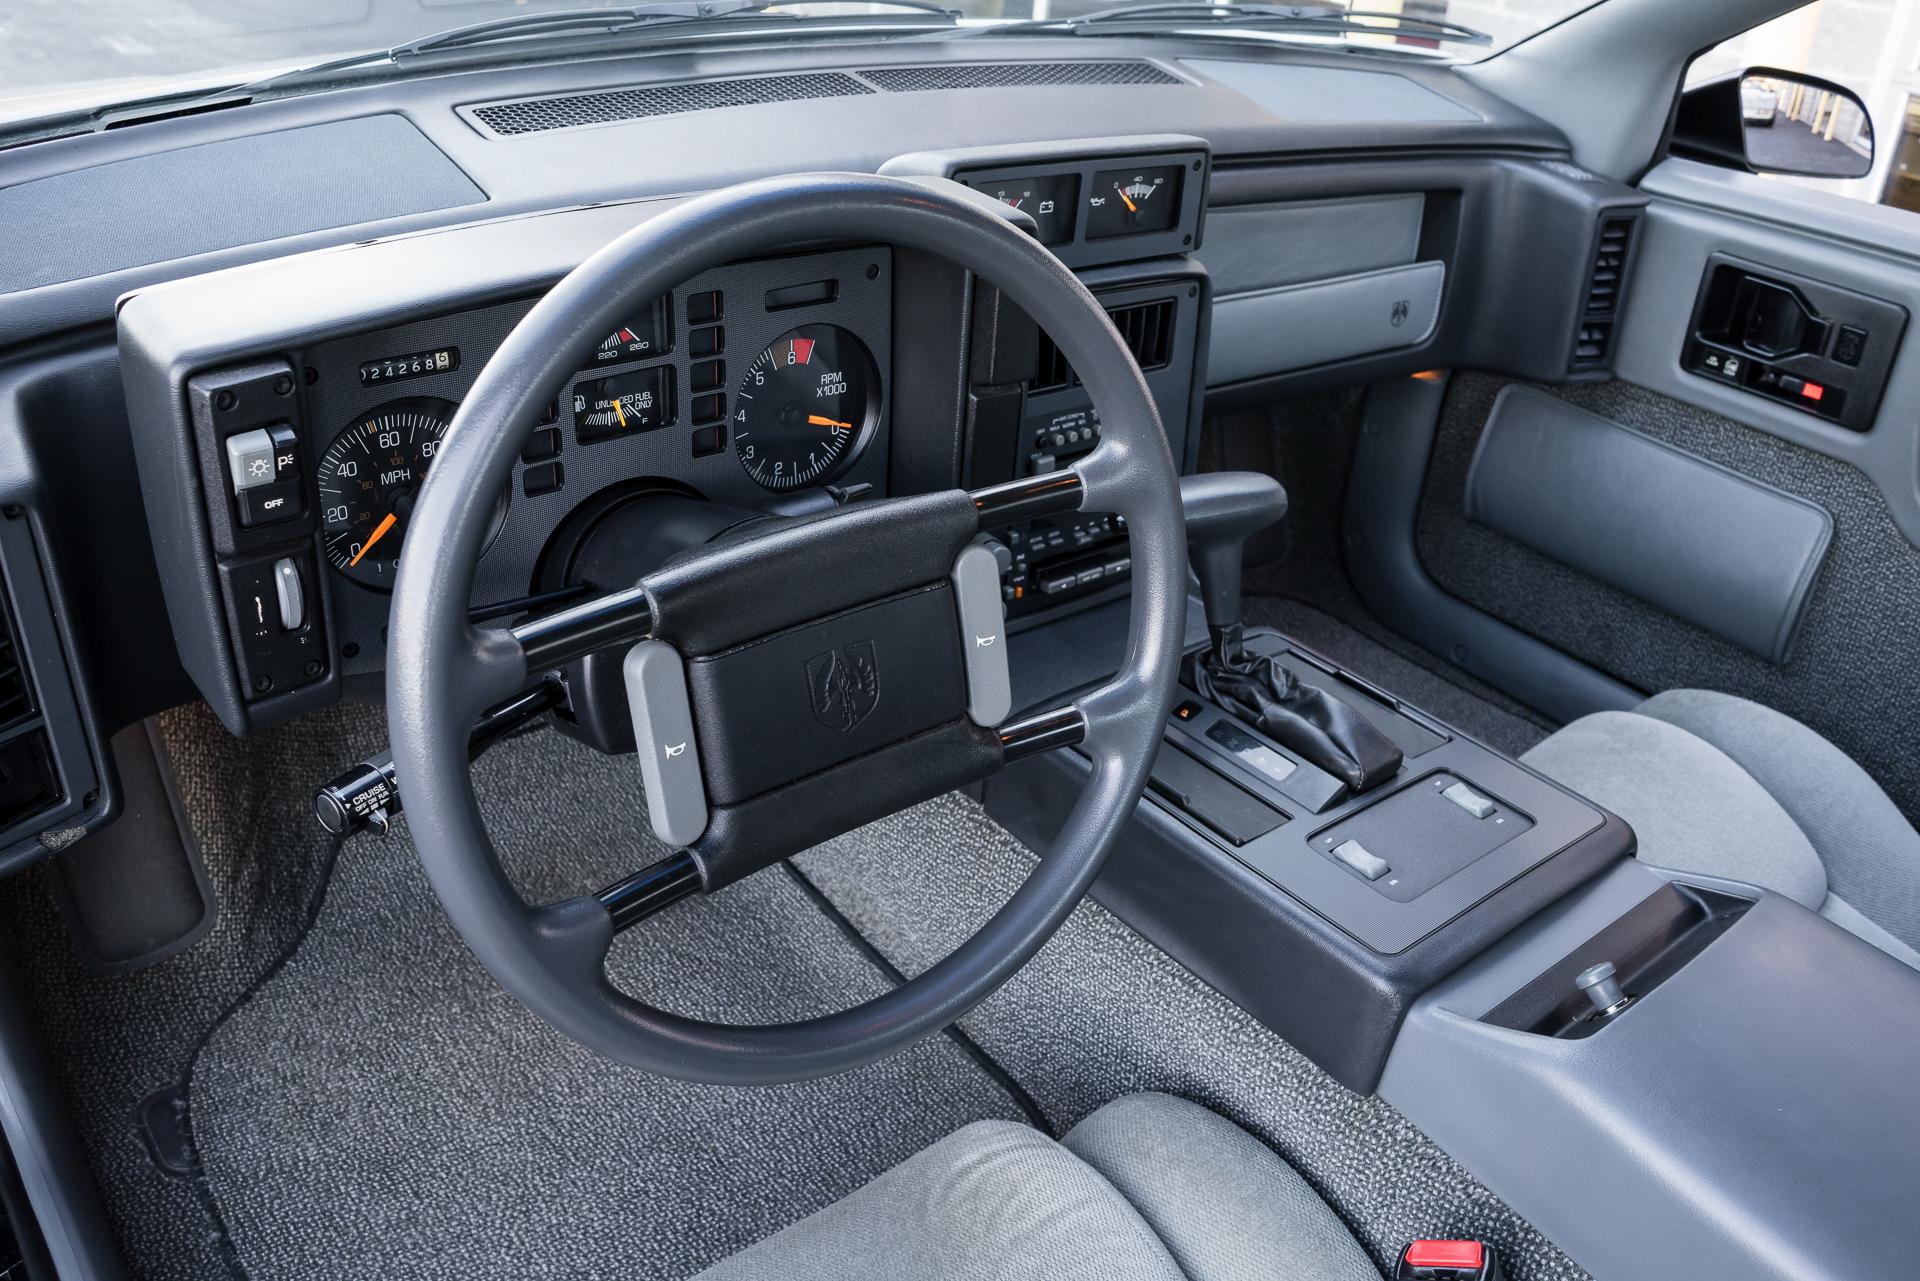 1988 Pontiac Fiero Fast Lane Classic Cars Console